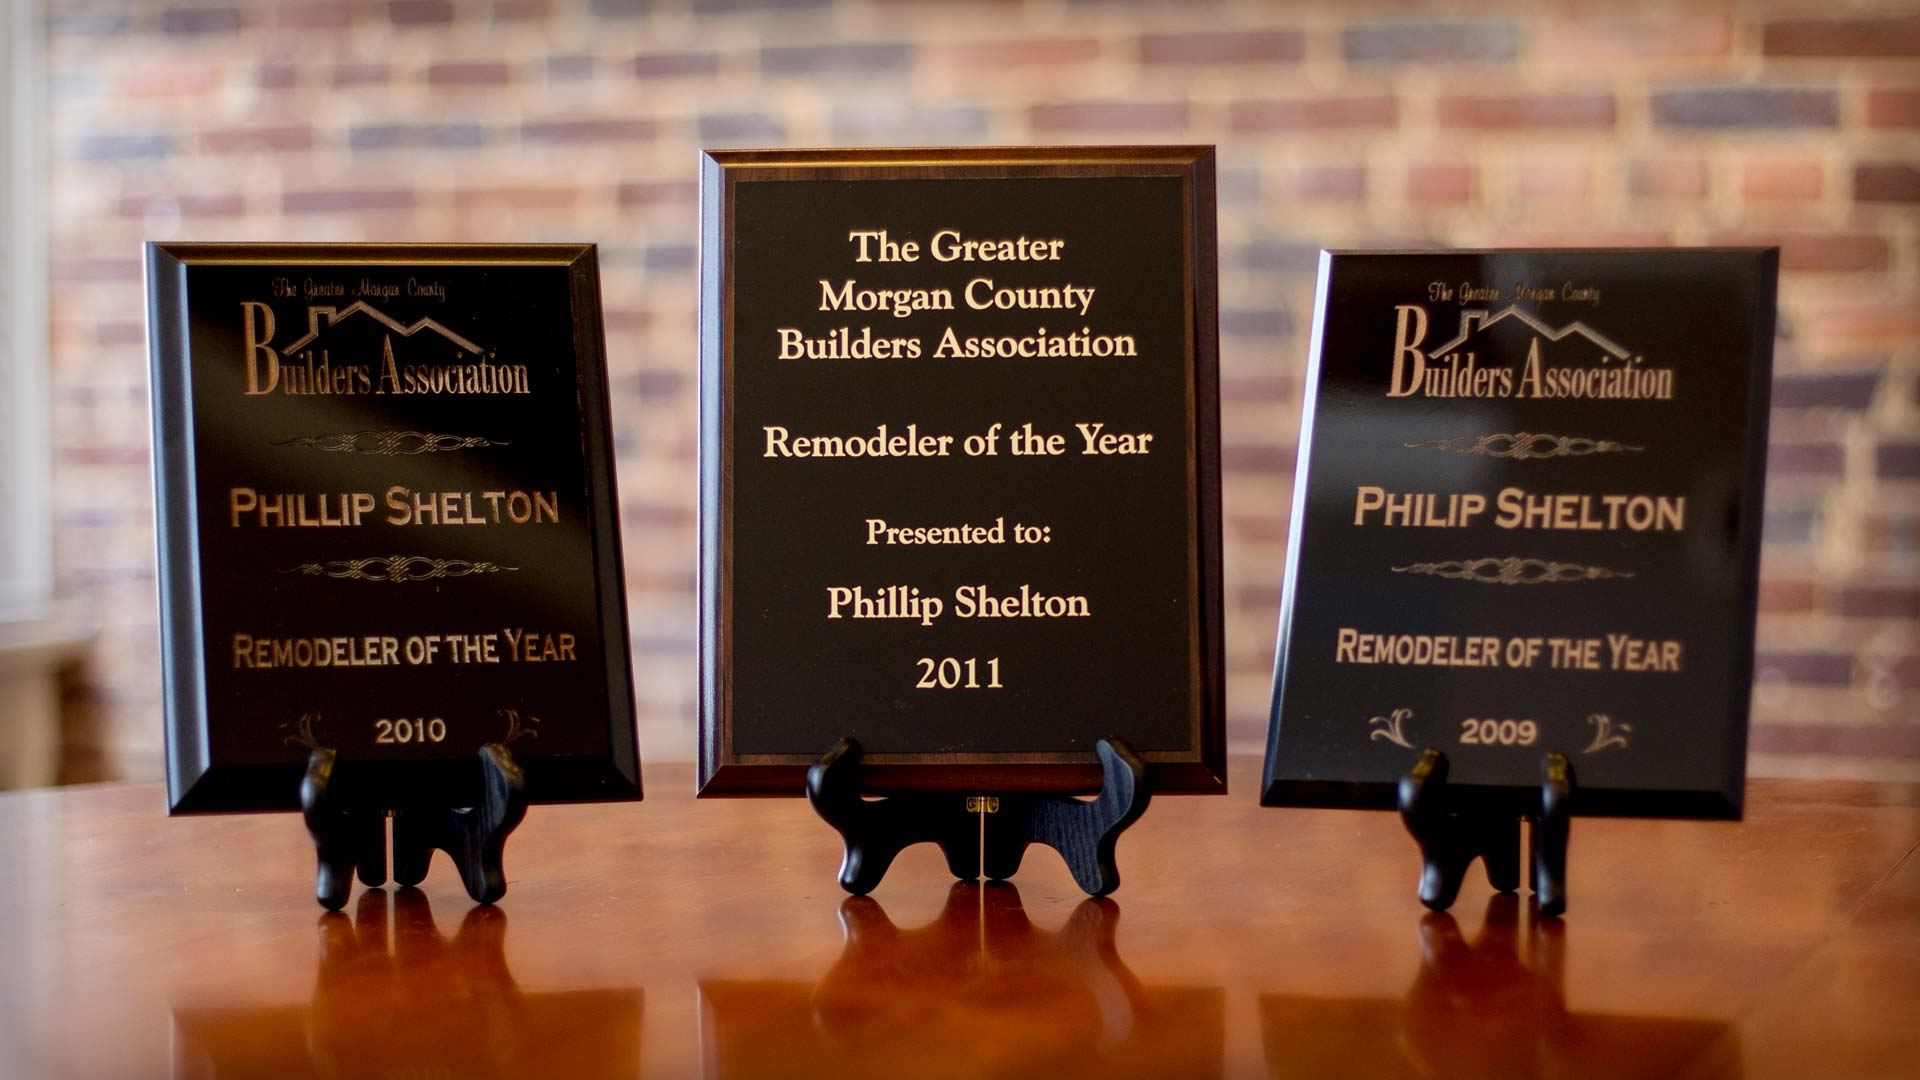 Shelton 2011 Remodeler of the Year Award